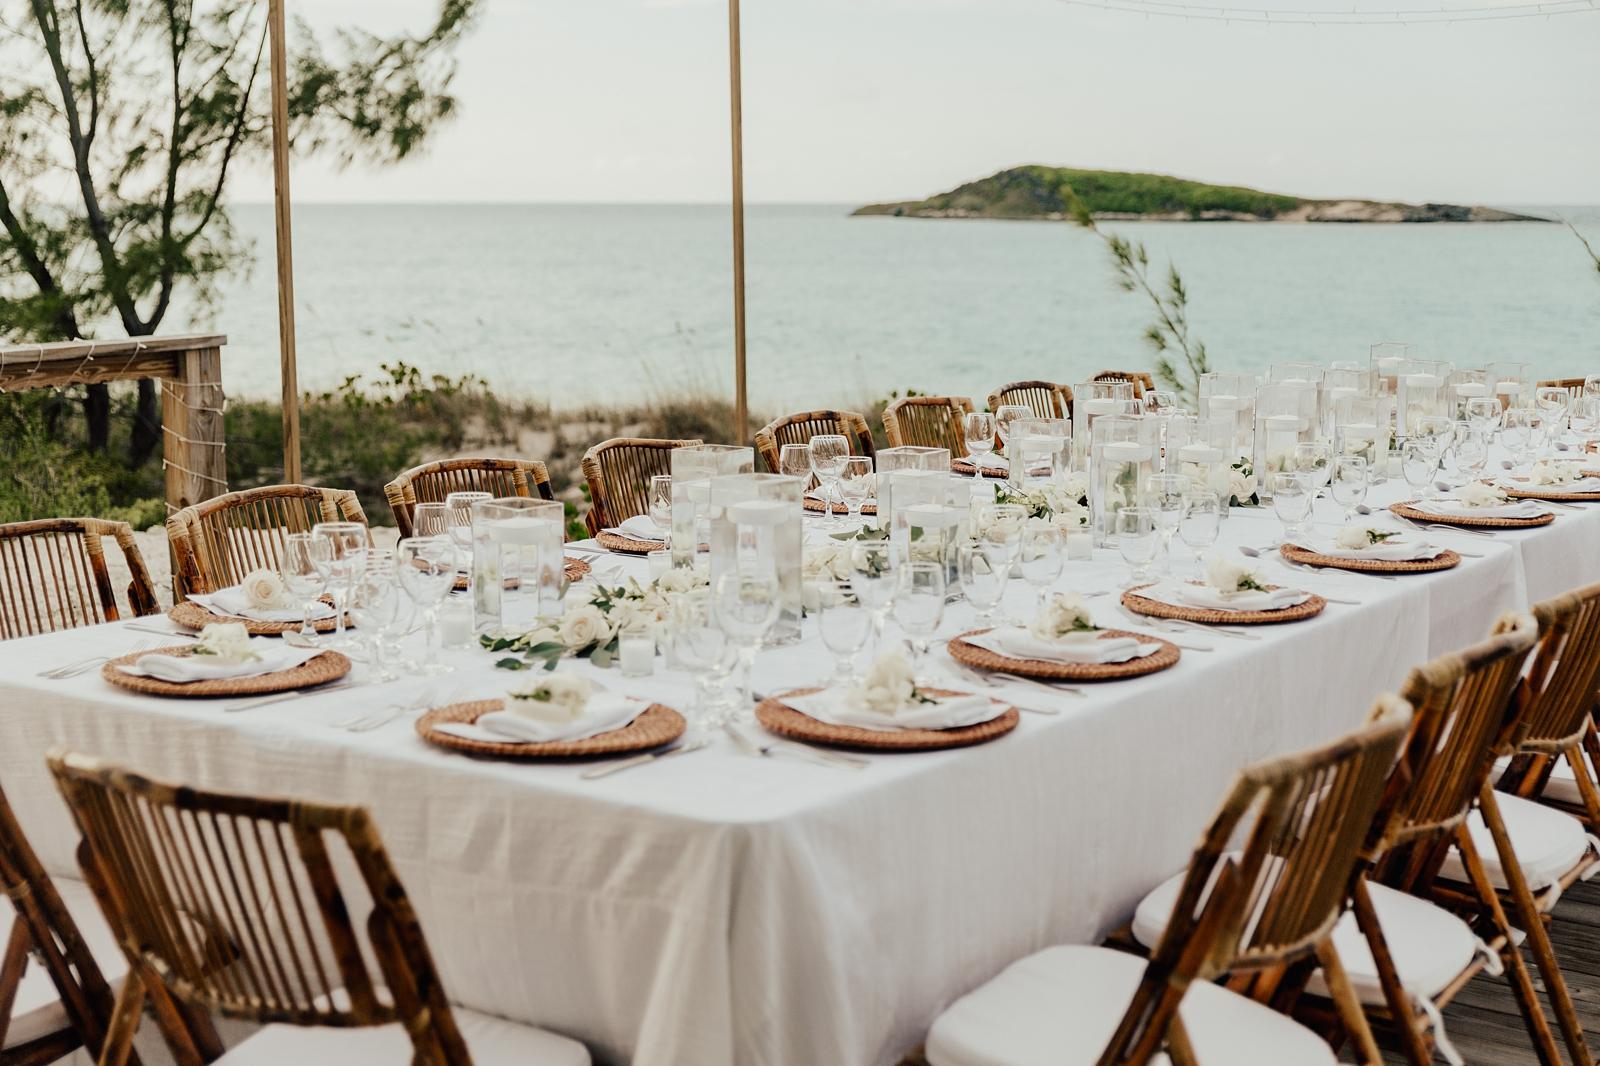 Jenni & Andrew Intimate Beach Destination Wedding in Little Exuma, Bahamas_0519.jpg